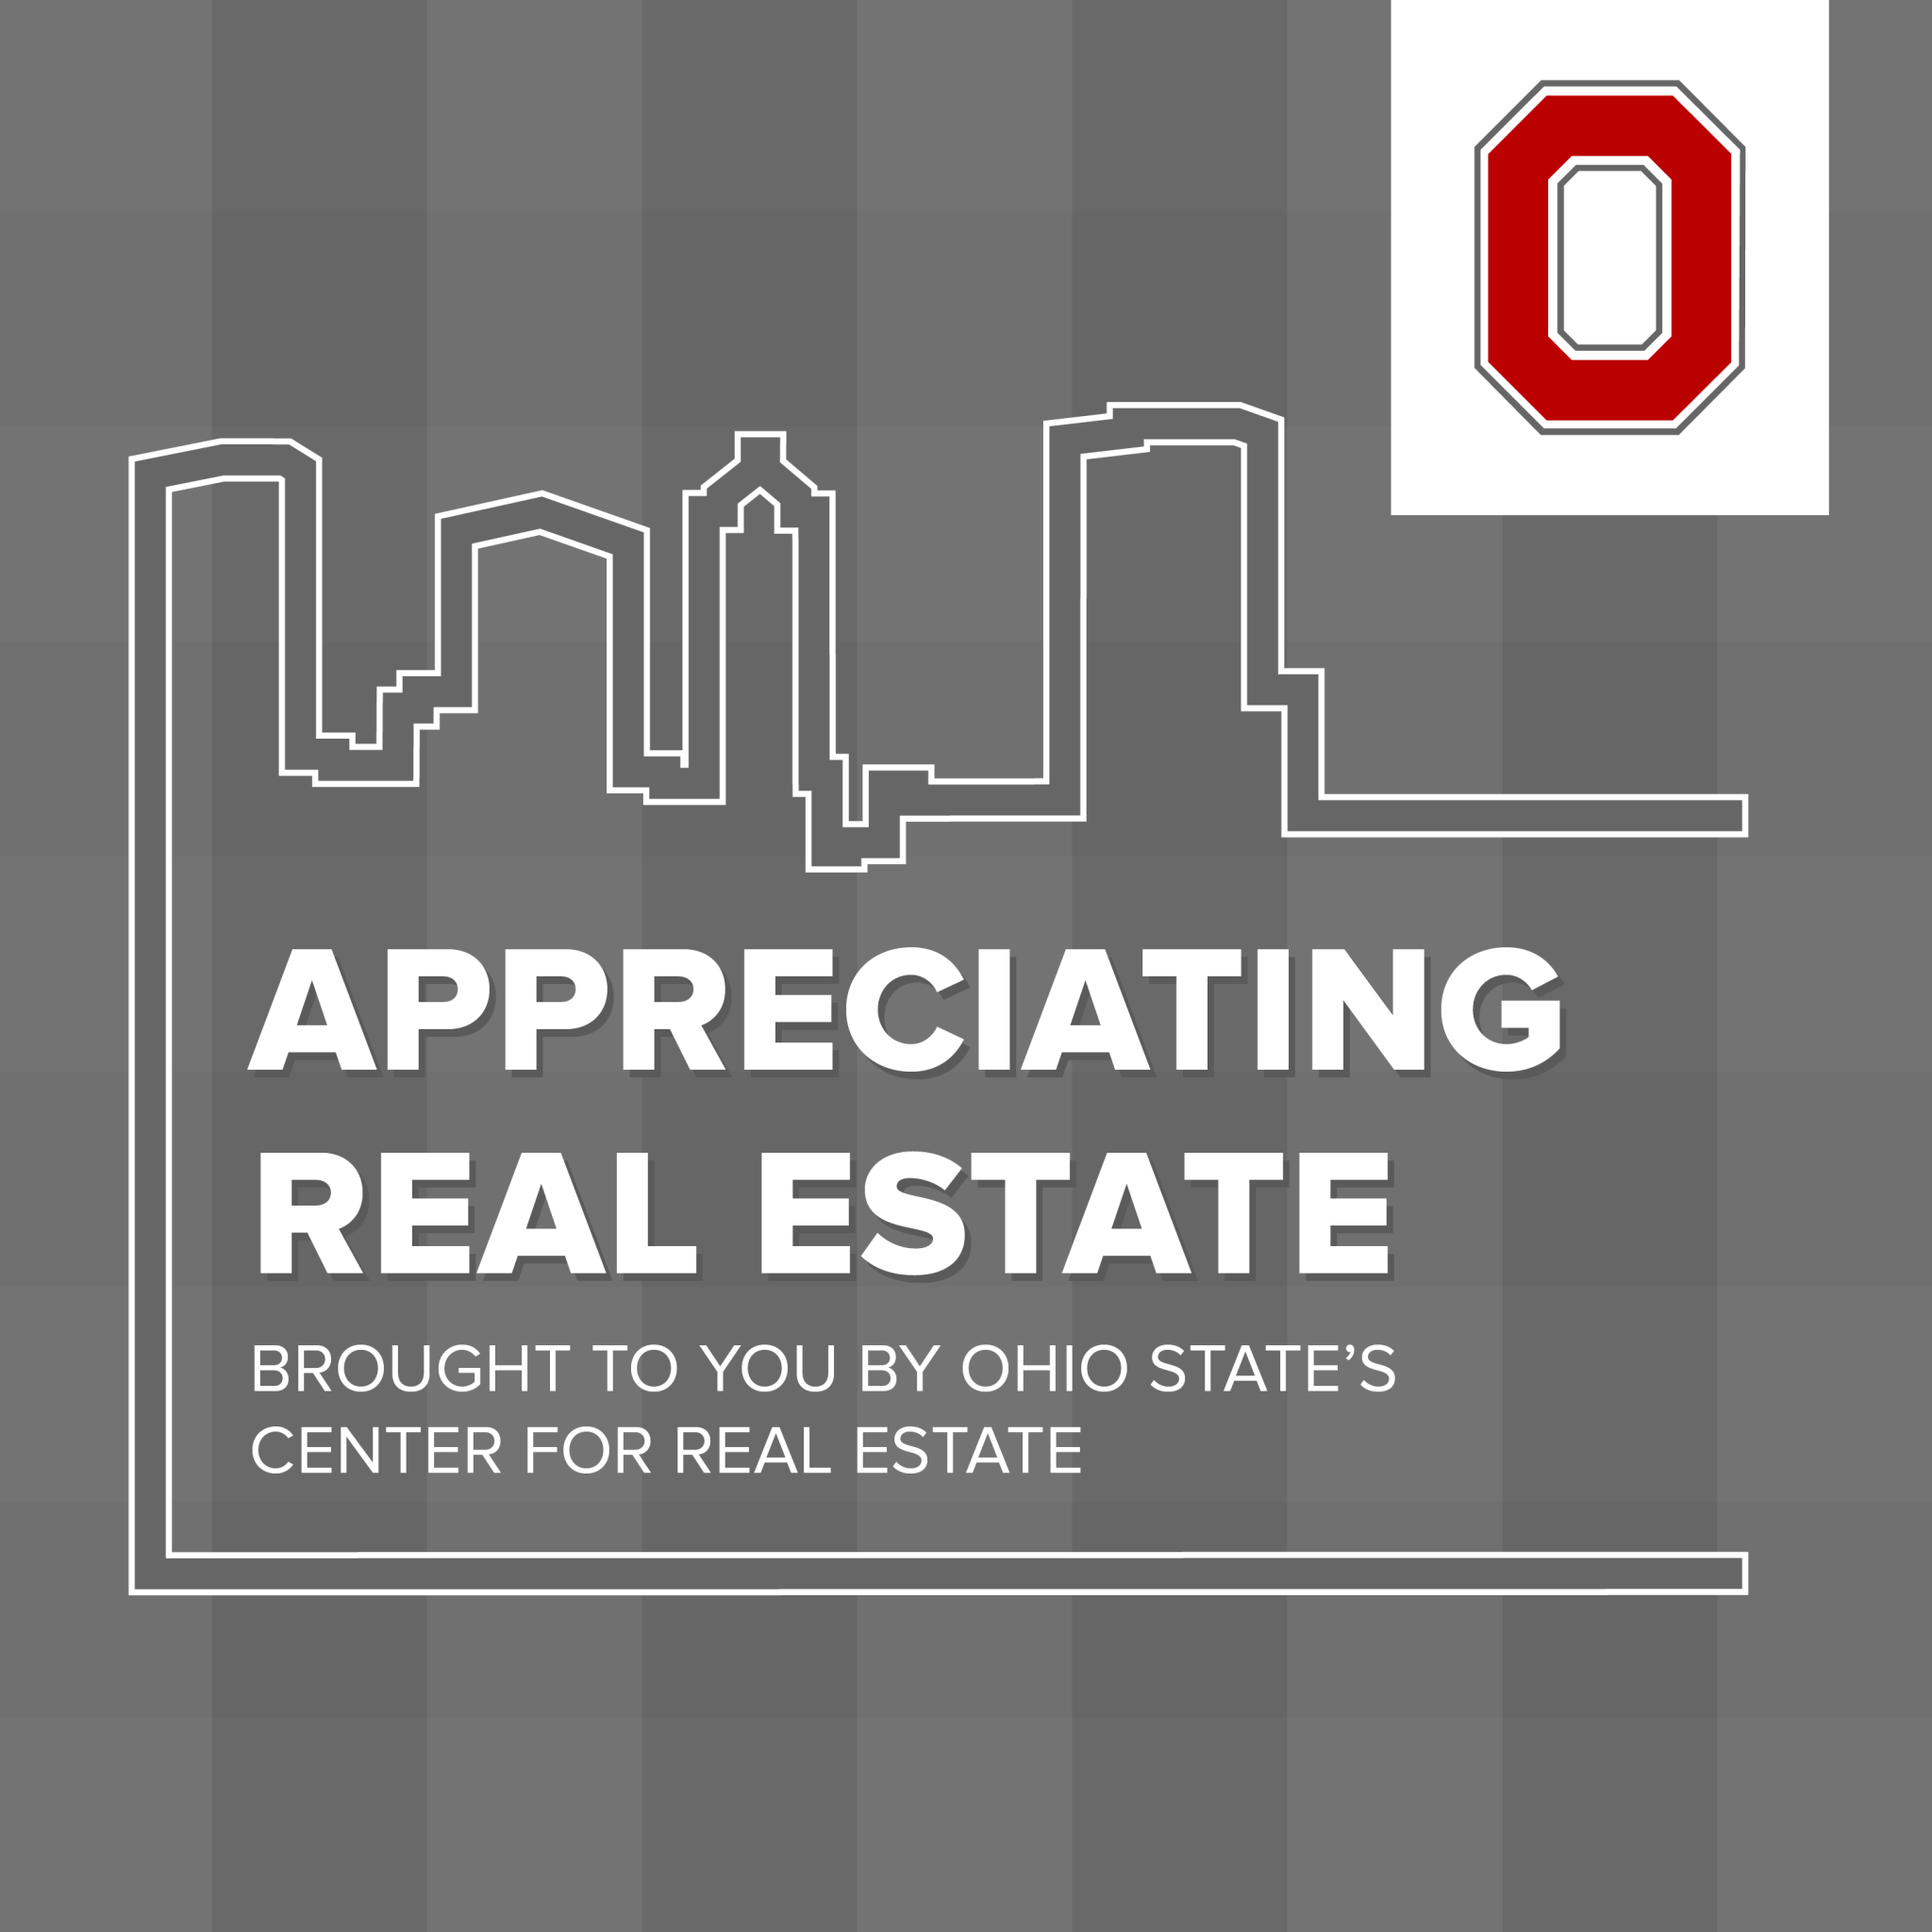 Appreciating Real Estate